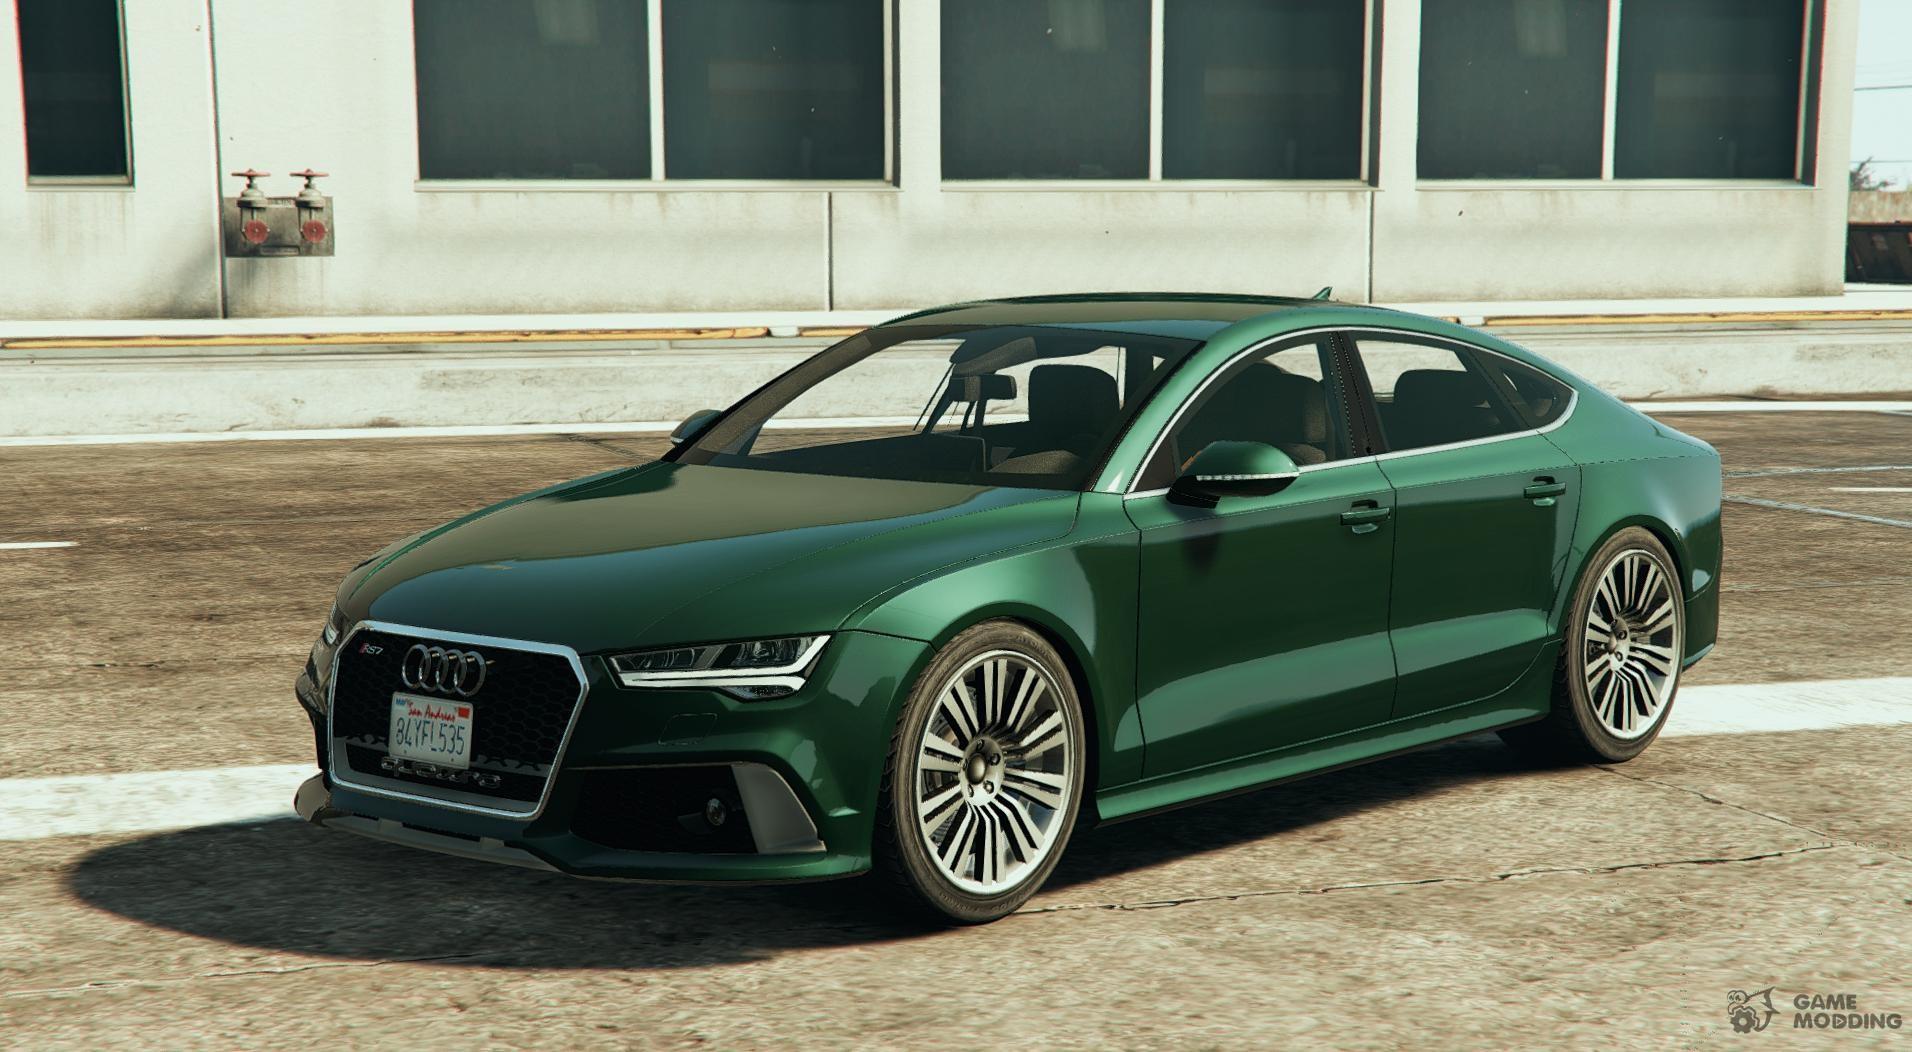 Audi For GTA - Audi car gta 5